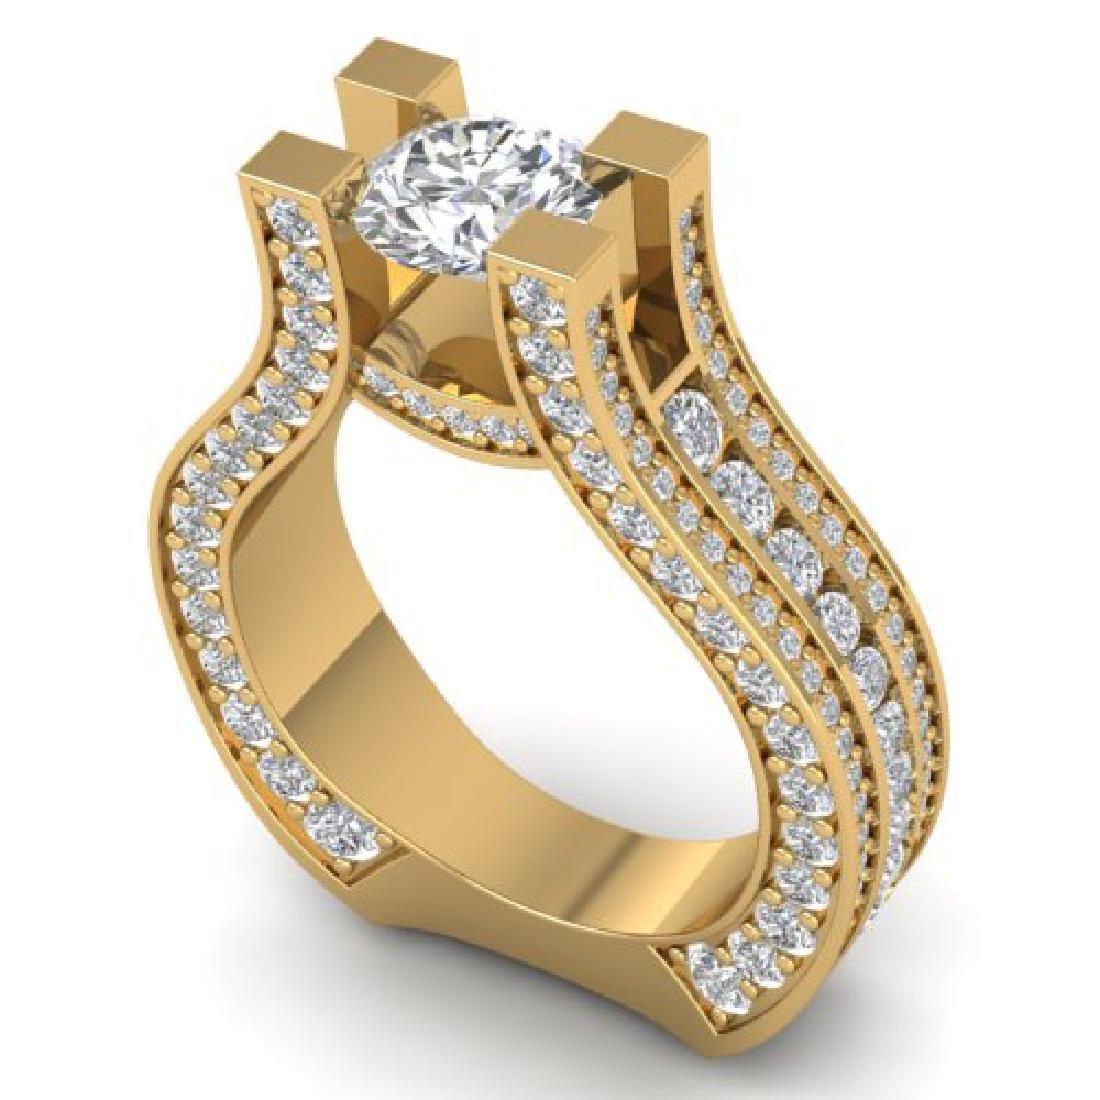 4.5 CTW Certified VS/SI Diamond Art Deco Micro Ring 18K - 2